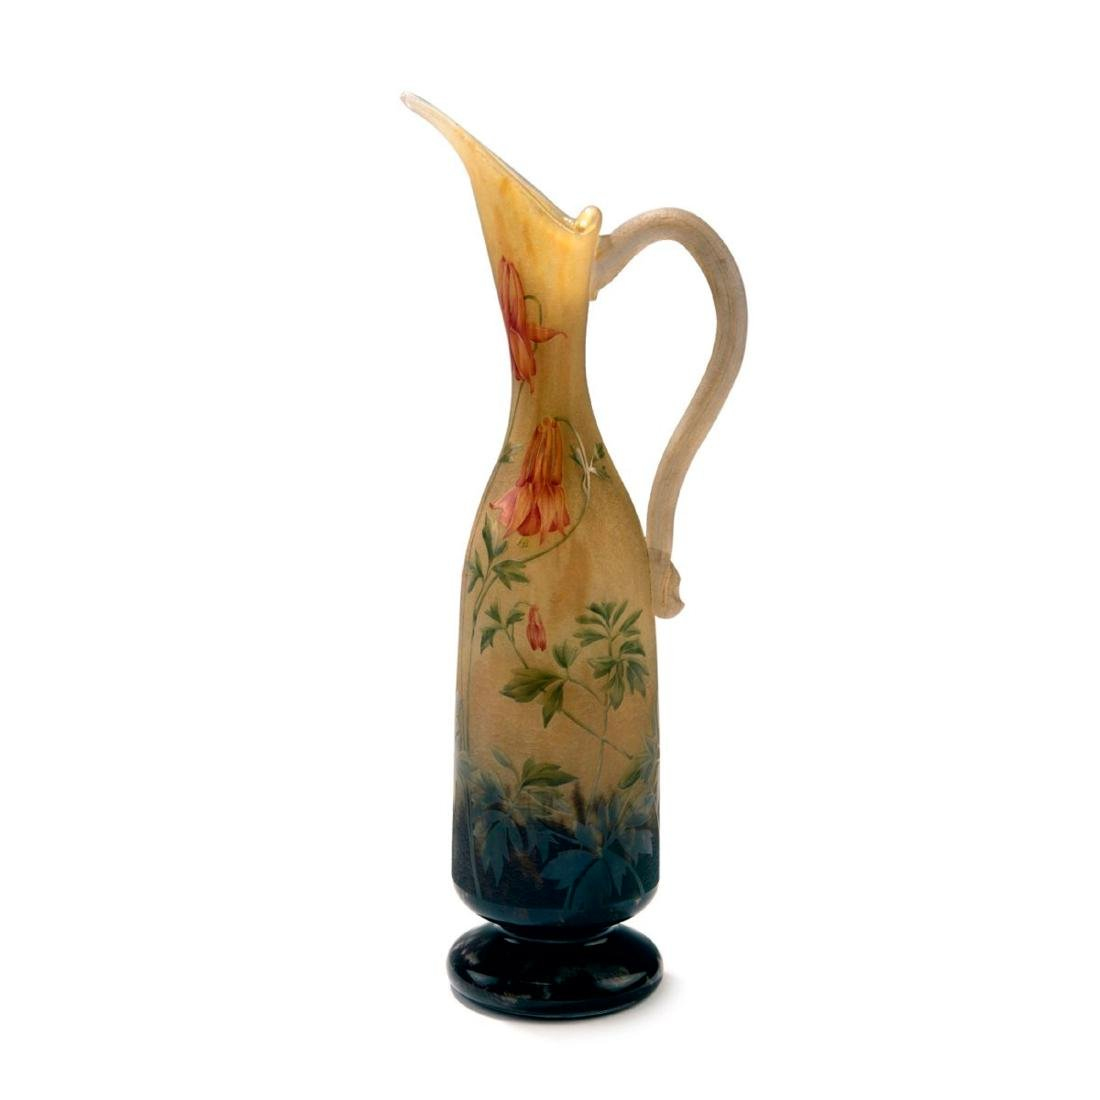 'Ancolies' jug, c. 1910